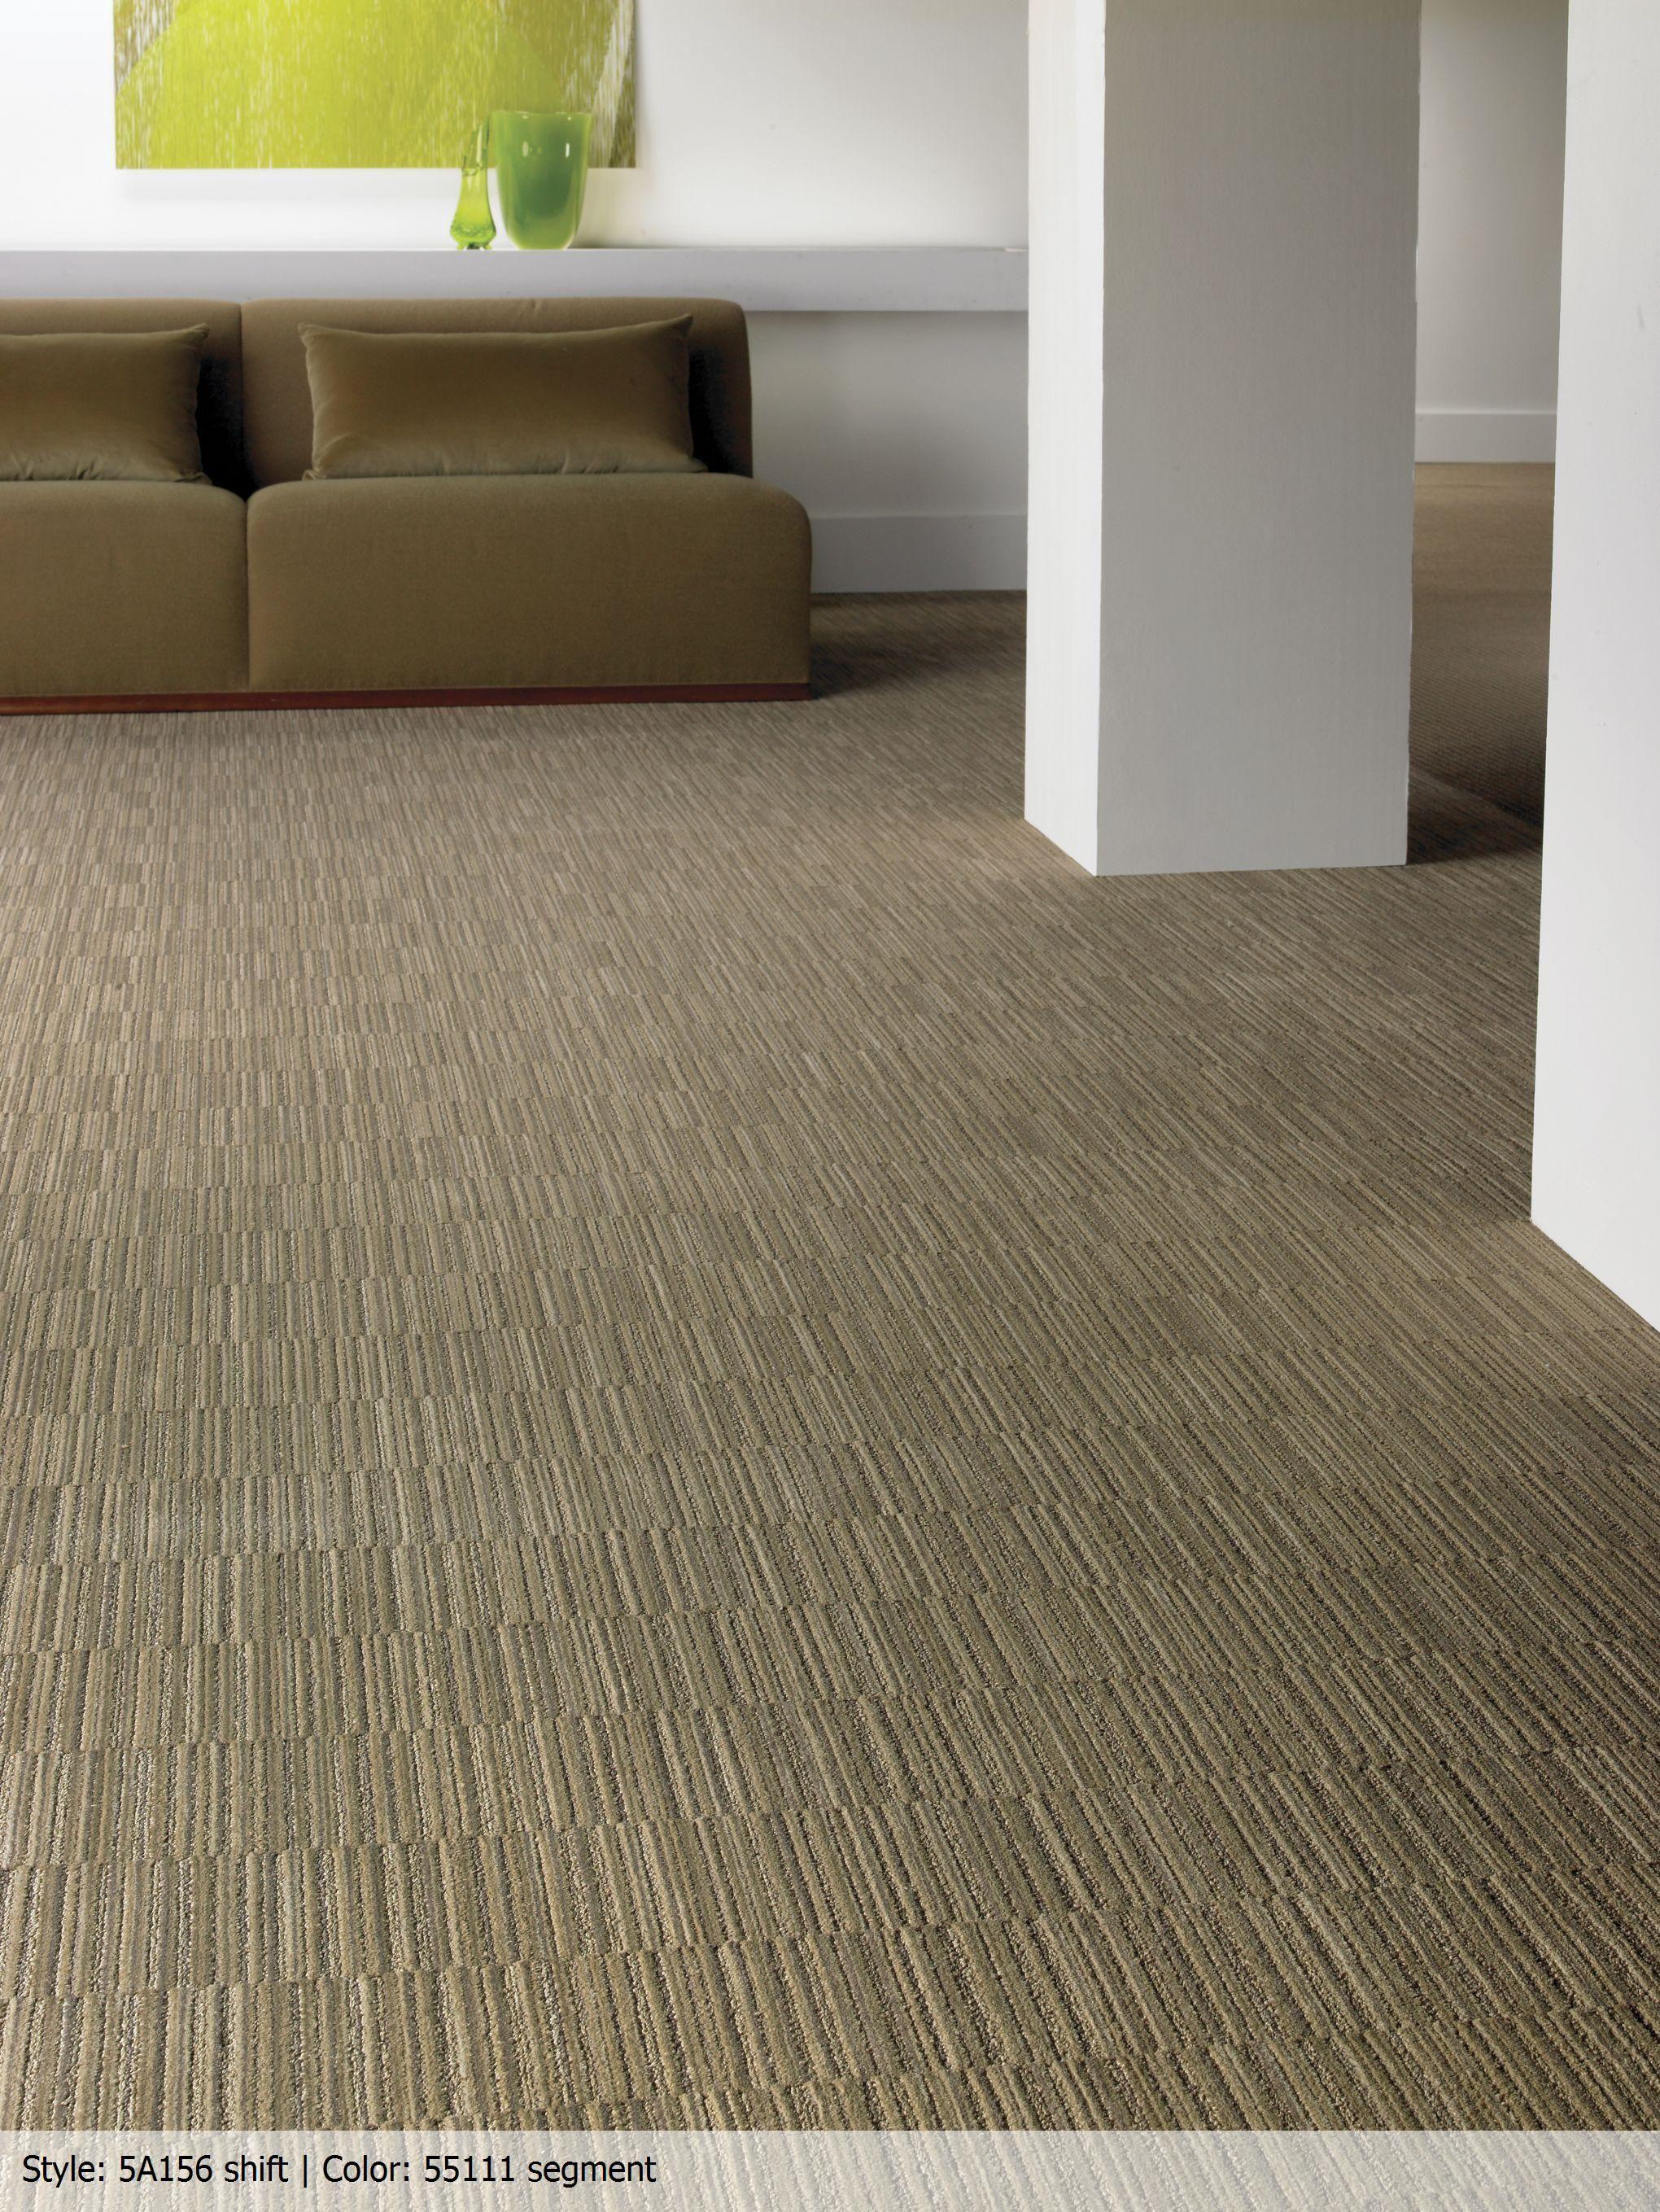 Shaw EcoWorx Broadloom Carpet with EcoSolution Q Yarn | Products | GECA